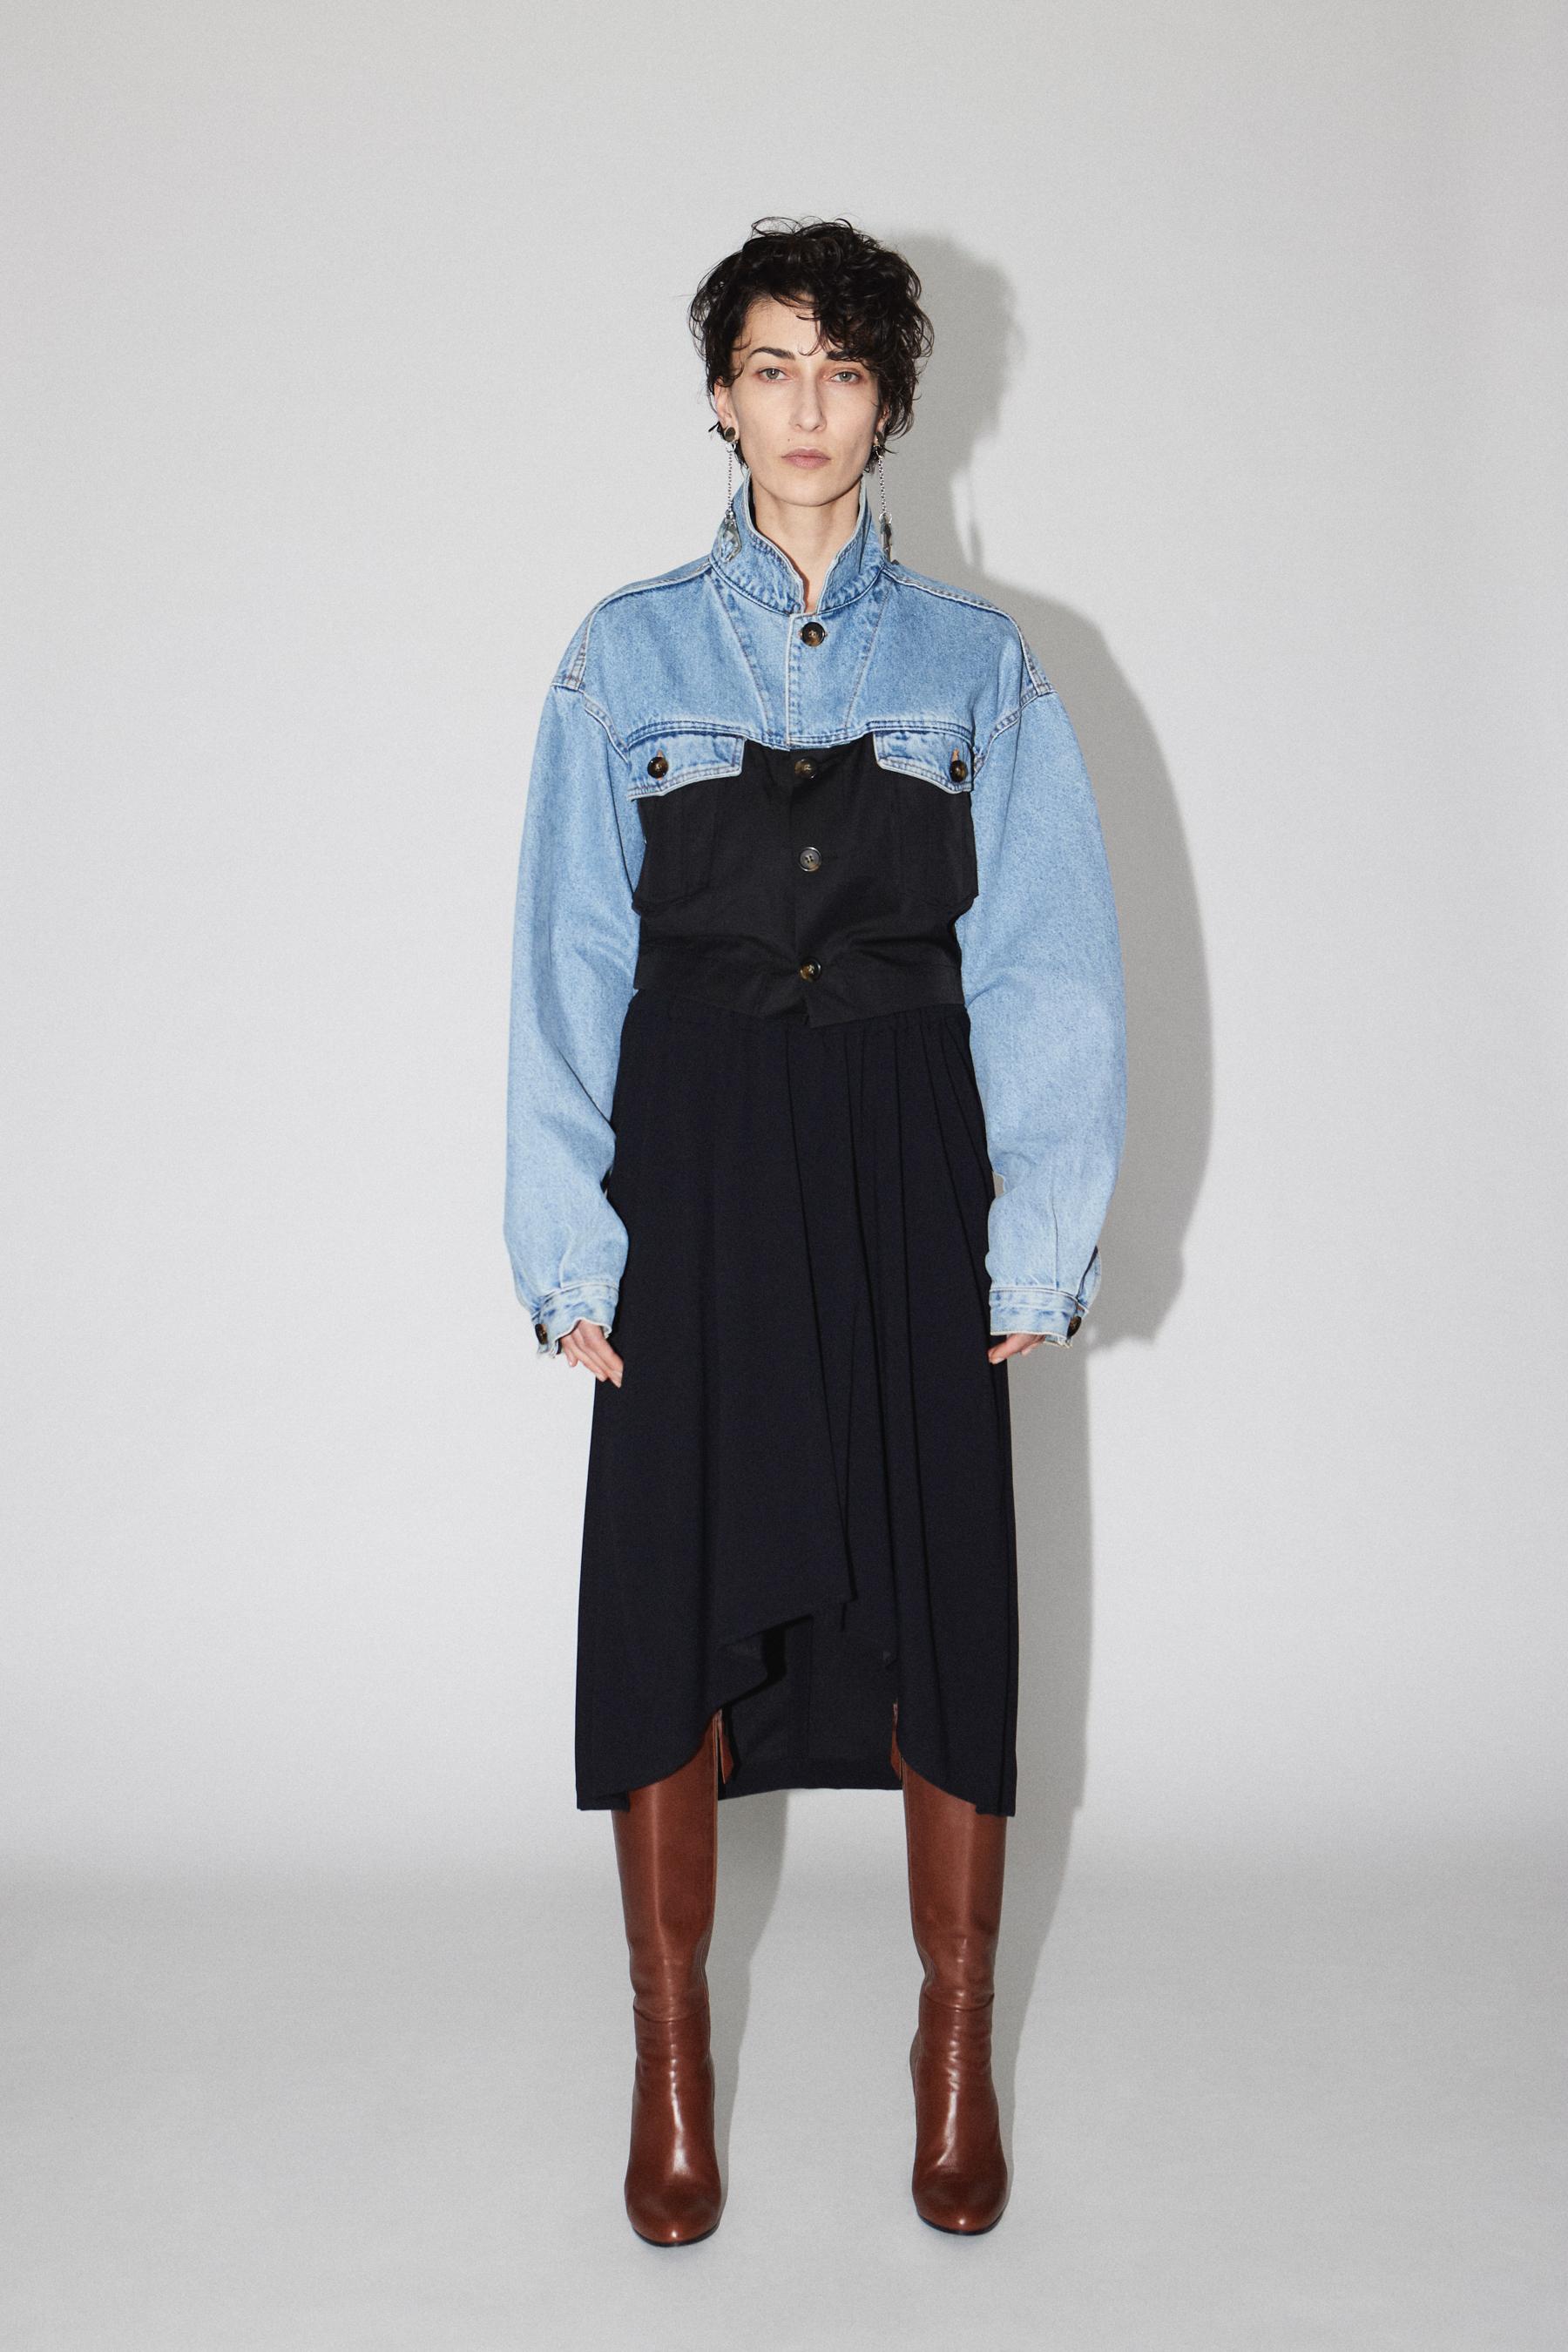 Lutz Huelle Fall 2021 Fashion Show